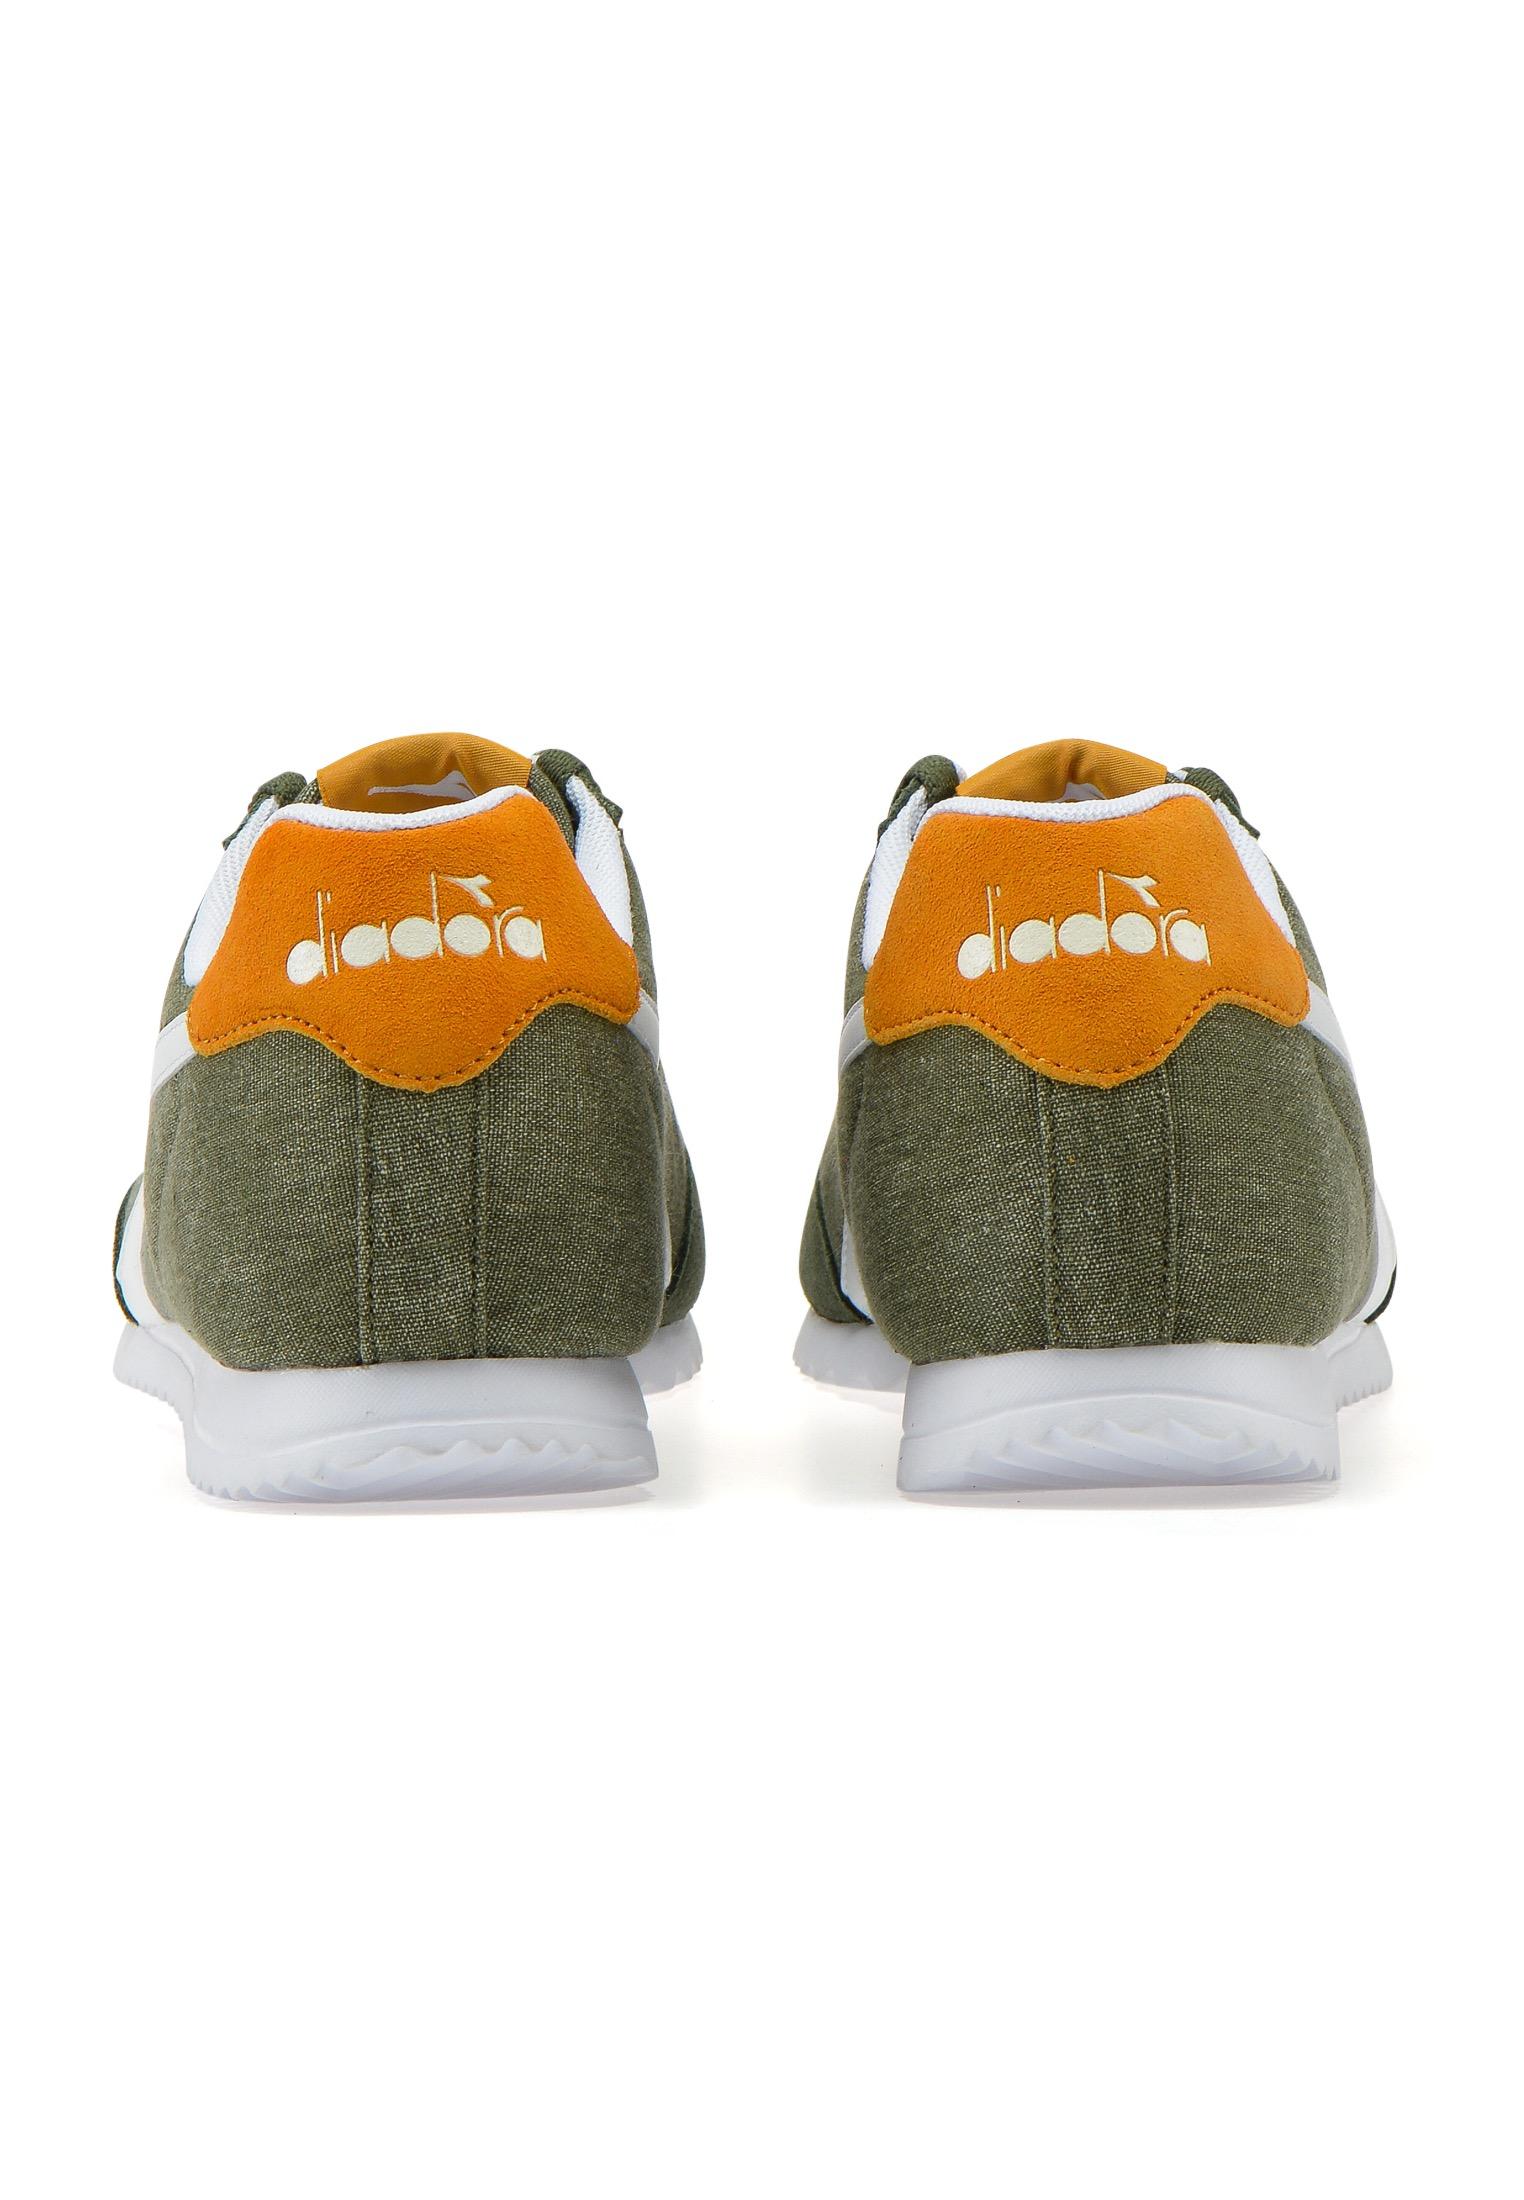 Scarpe-Diadora-Jog-Light-C-Sneakers-sportive-uomo-donna-vari-colori-e-taglie miniatura 43